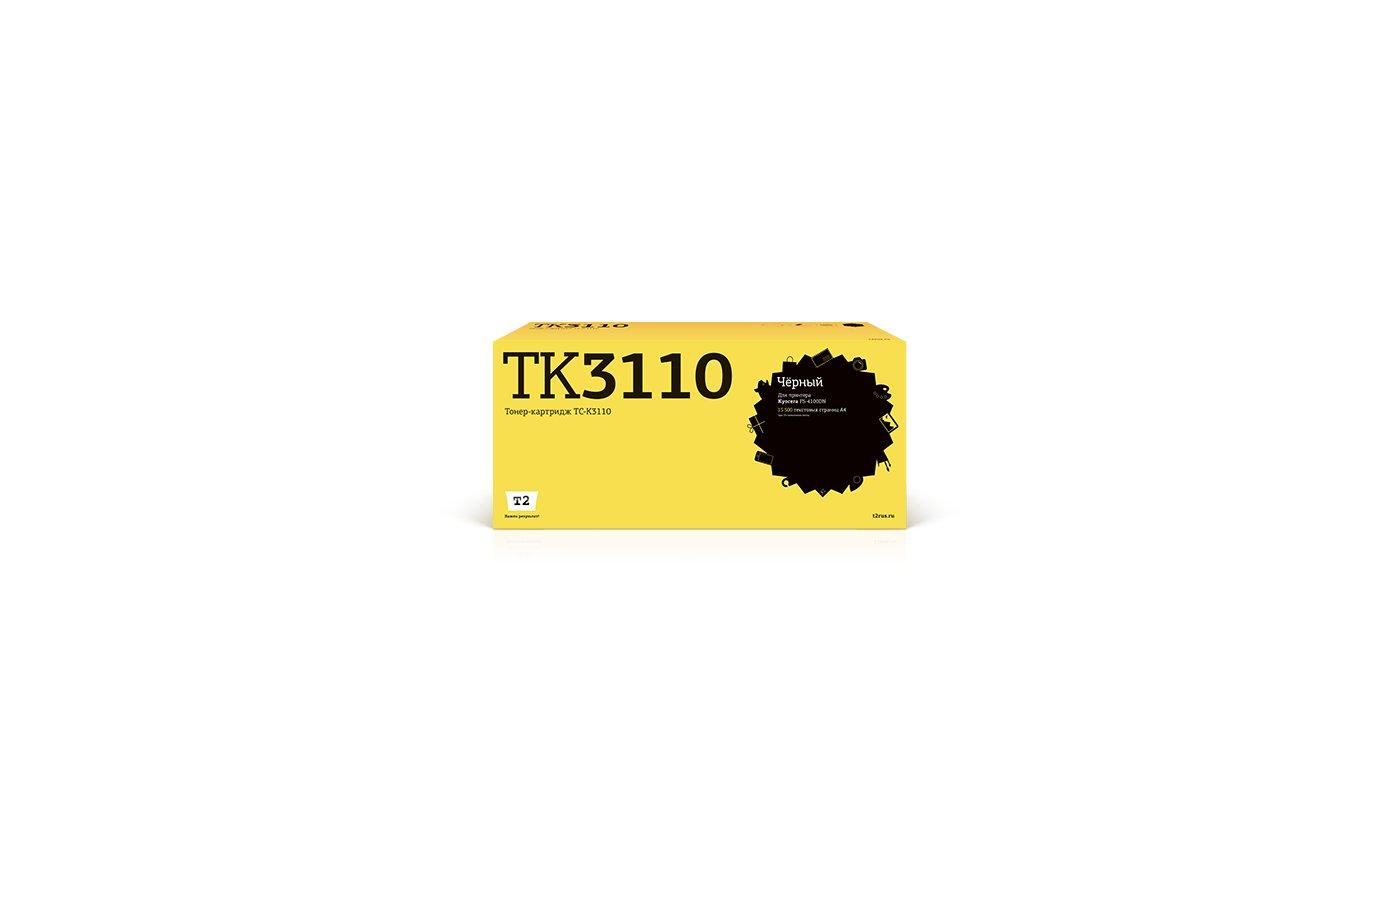 Картридж лазерный T2 совместимый TC-K3110 (TK-3110) для Kyocera FS-4100DN (15500 стр.) с чипом